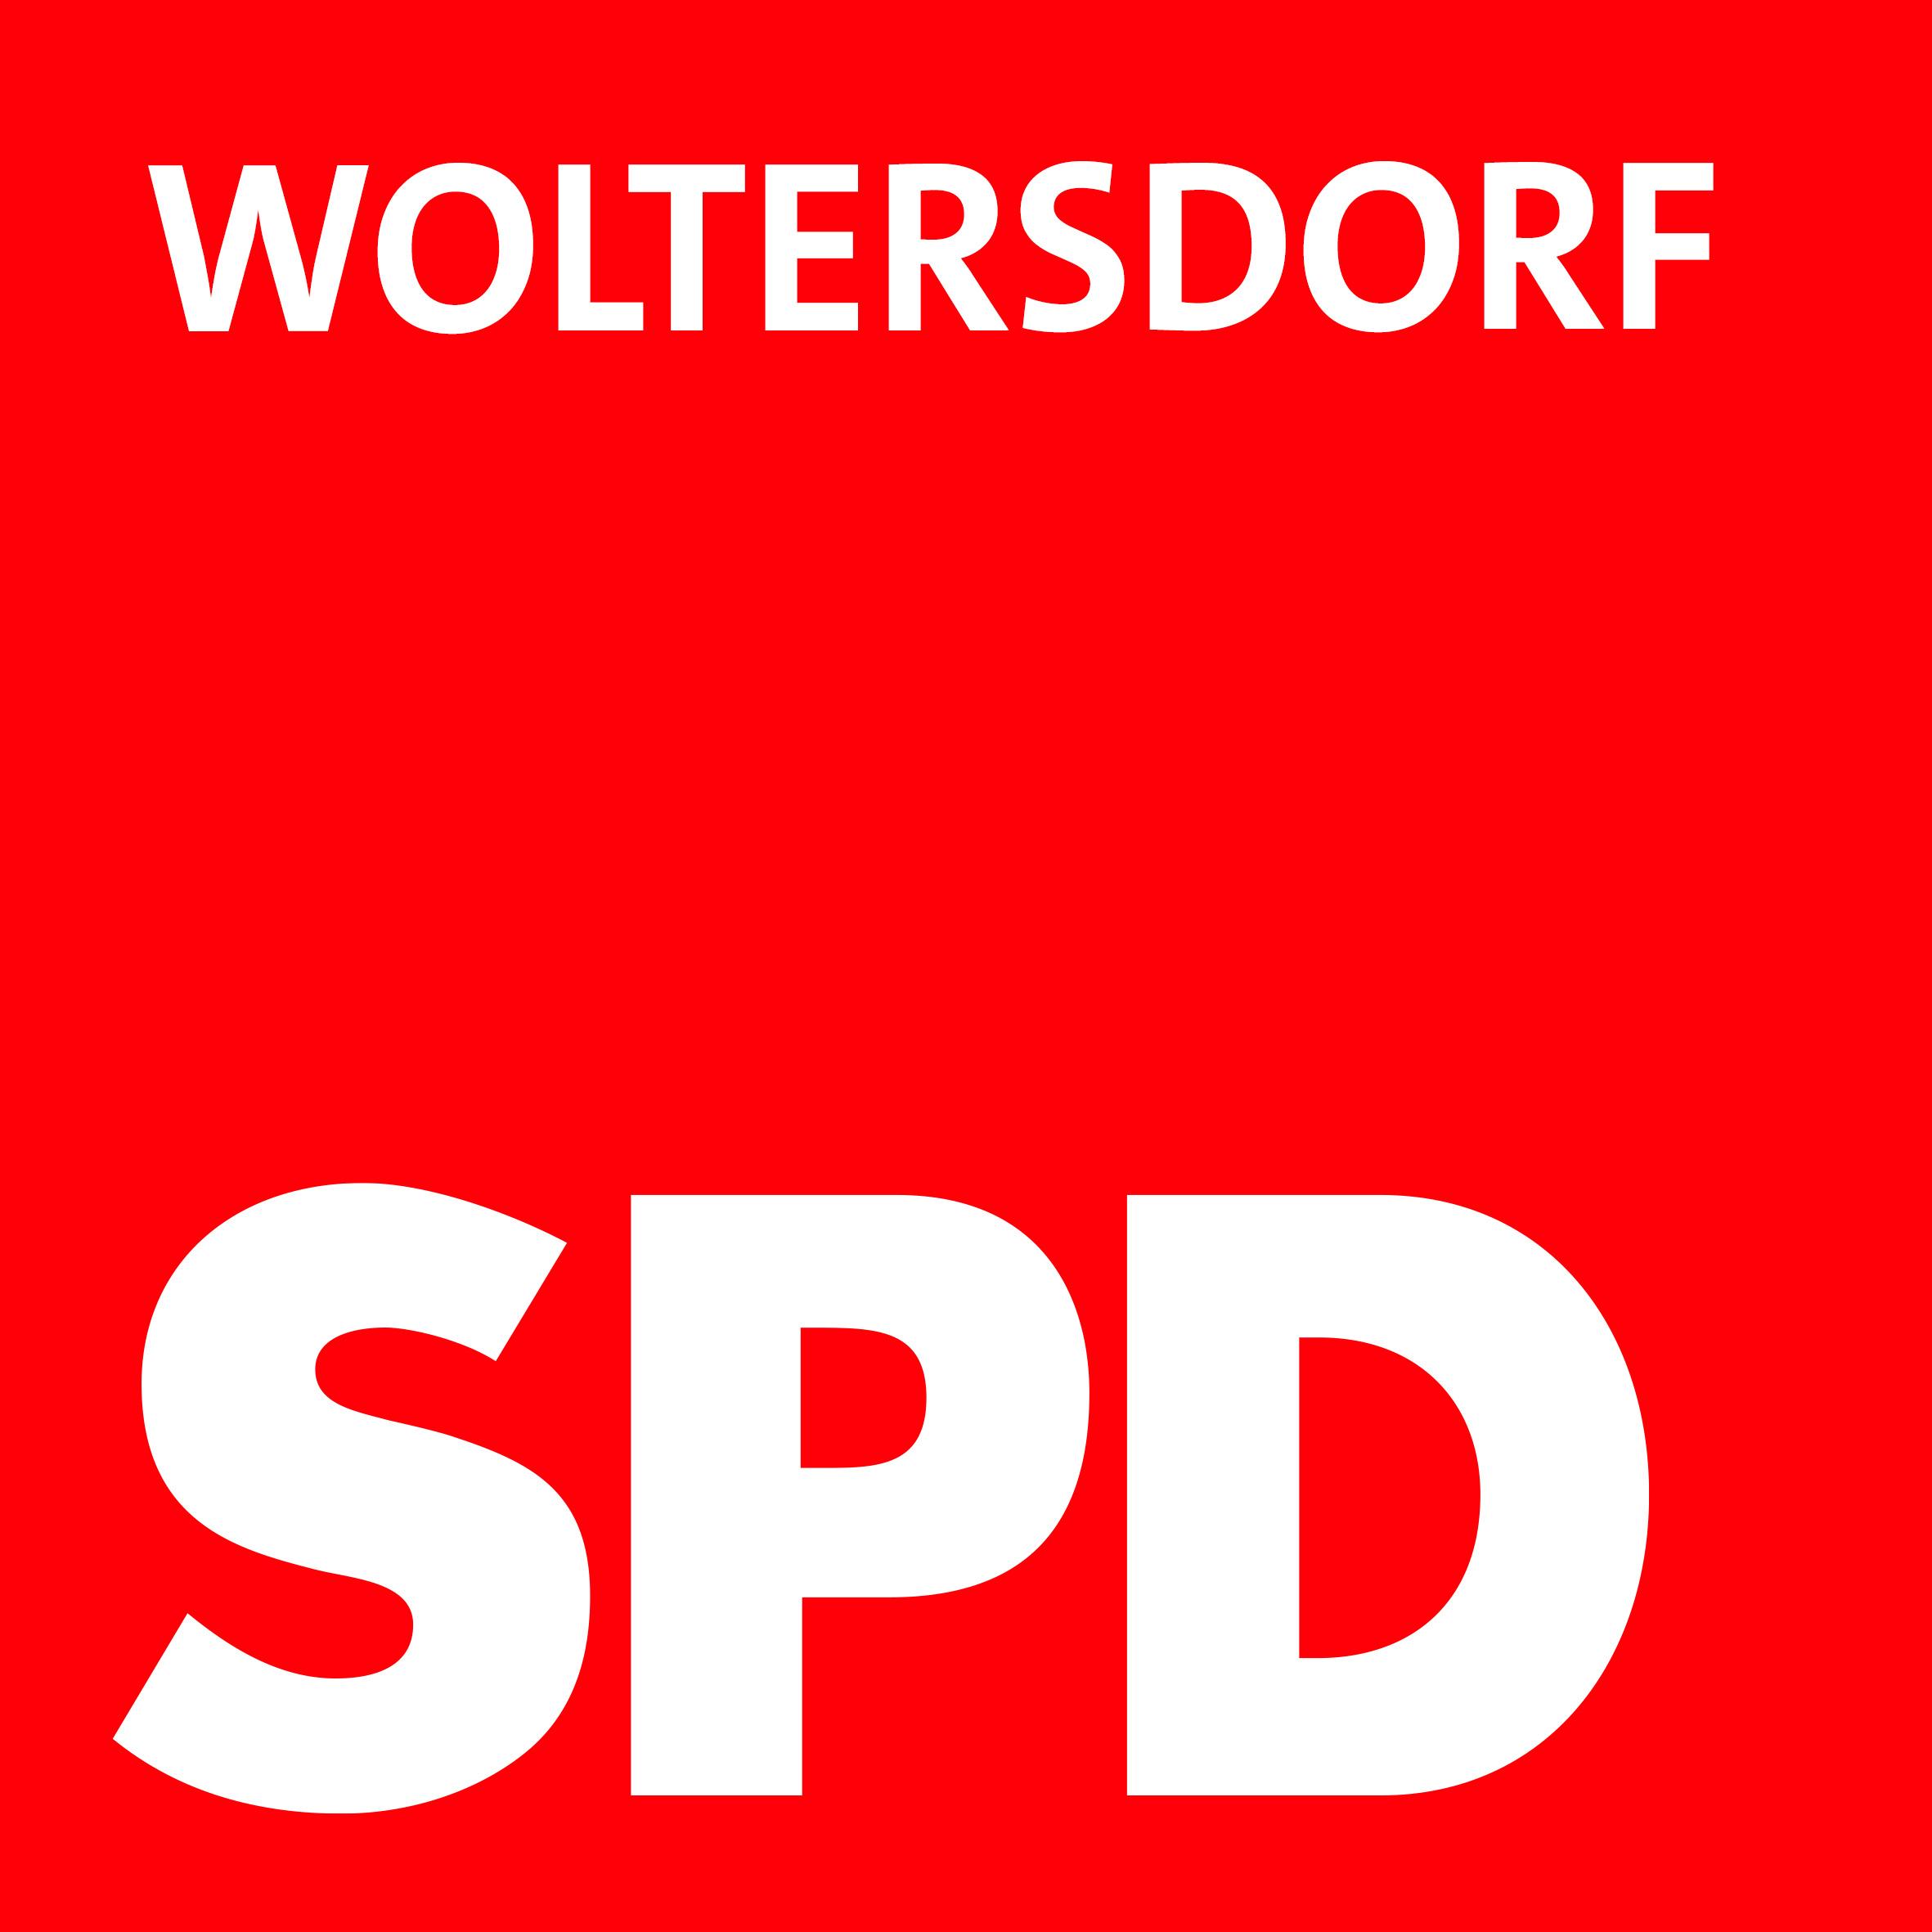 SPD Woltersdorf